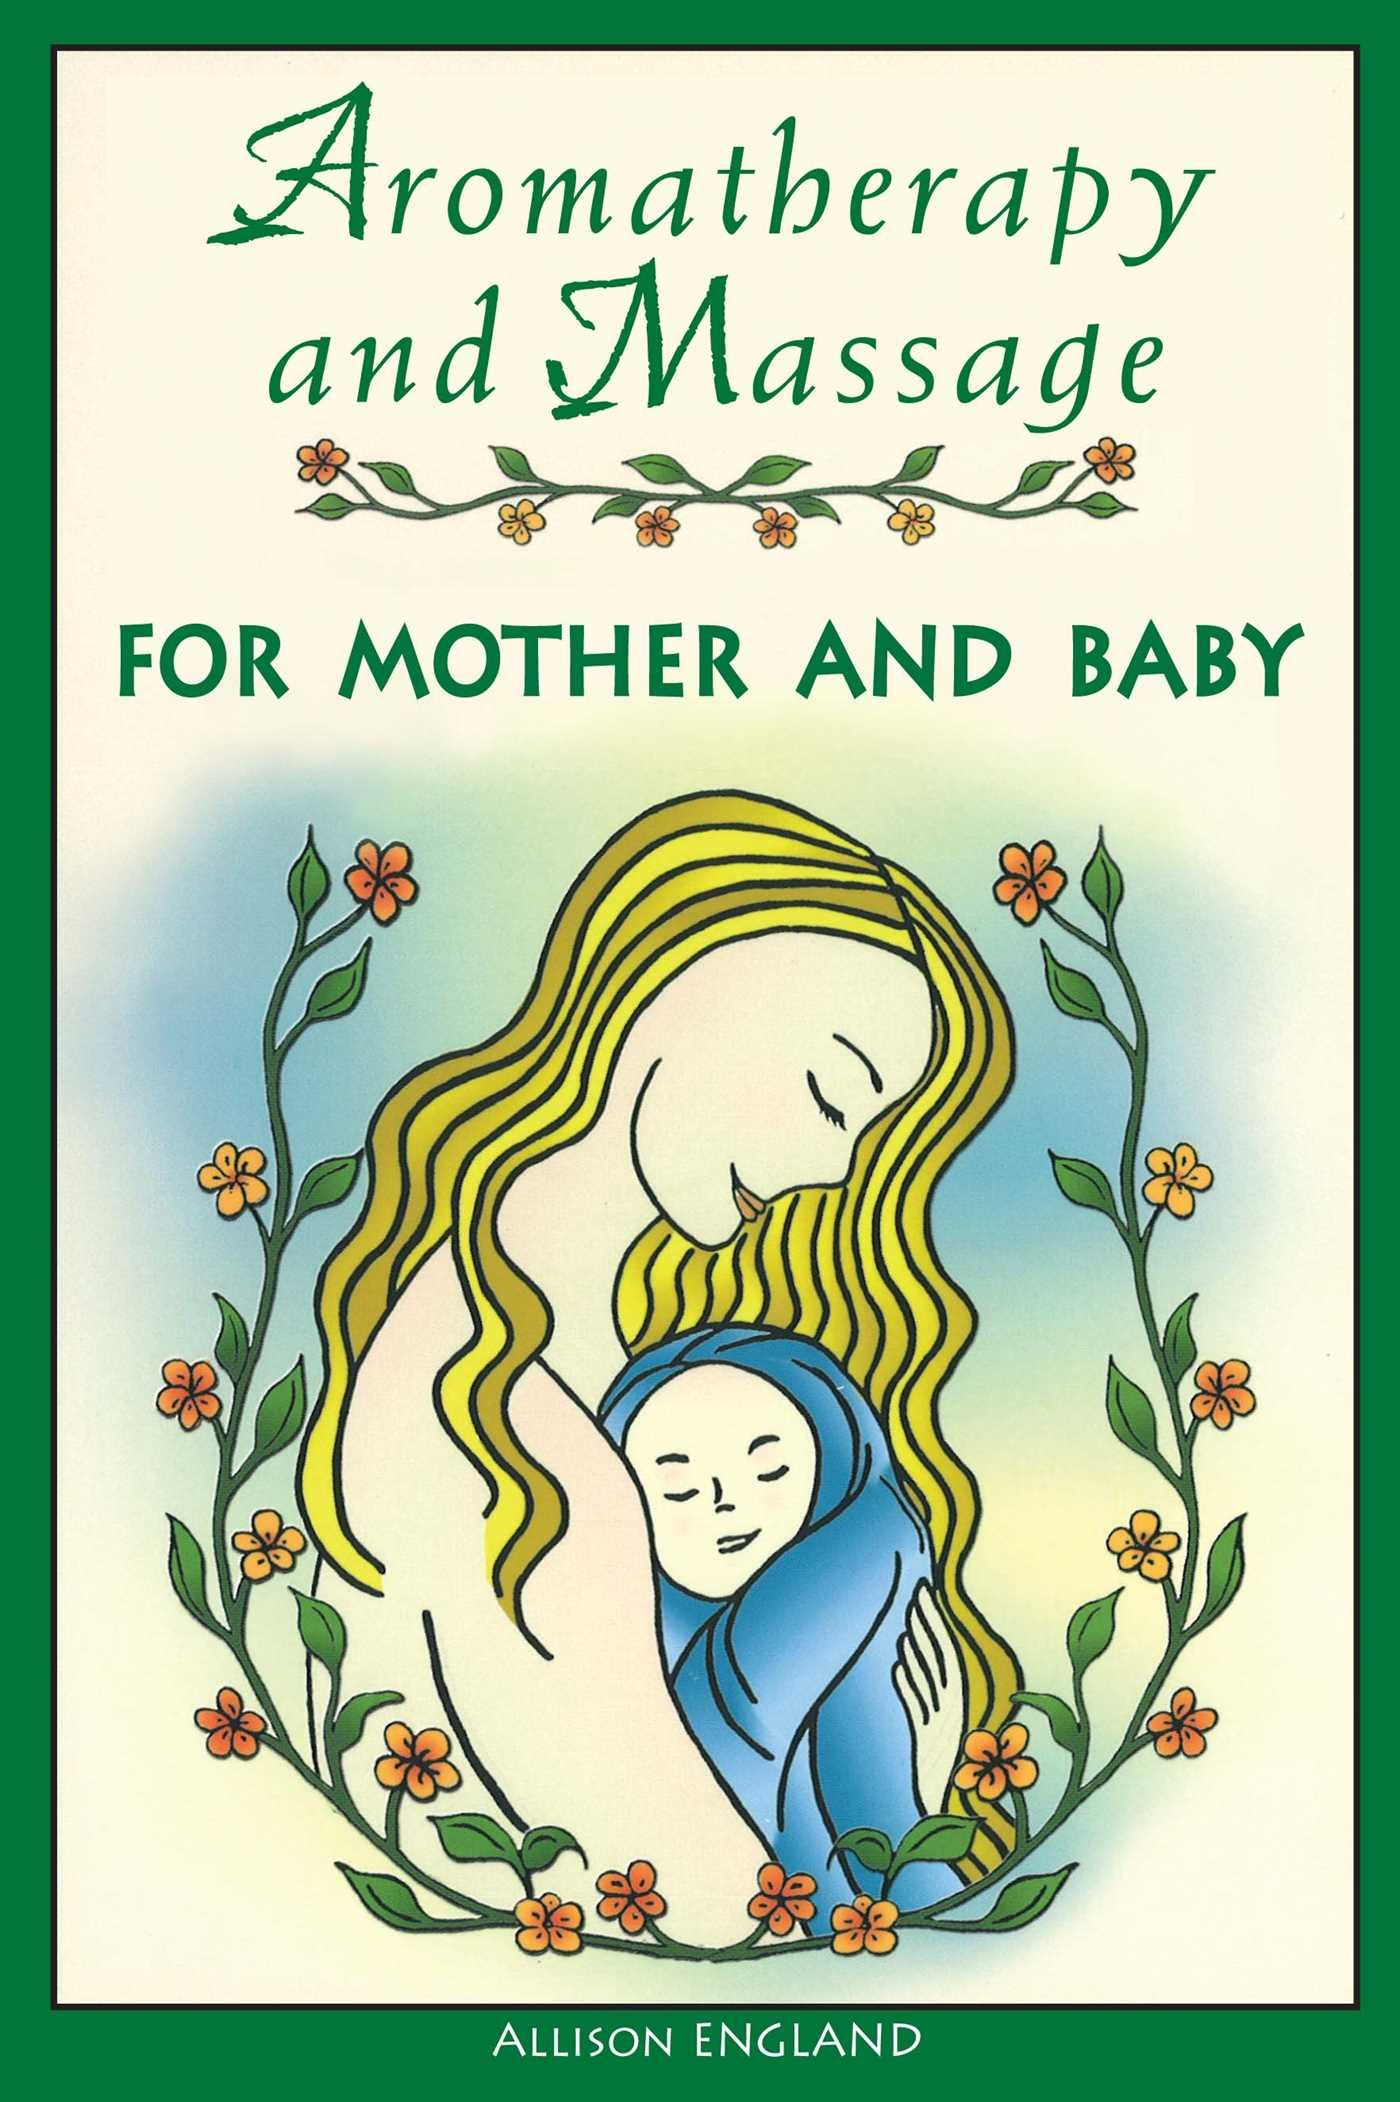 Aromatherapy Massage Mother Allison England